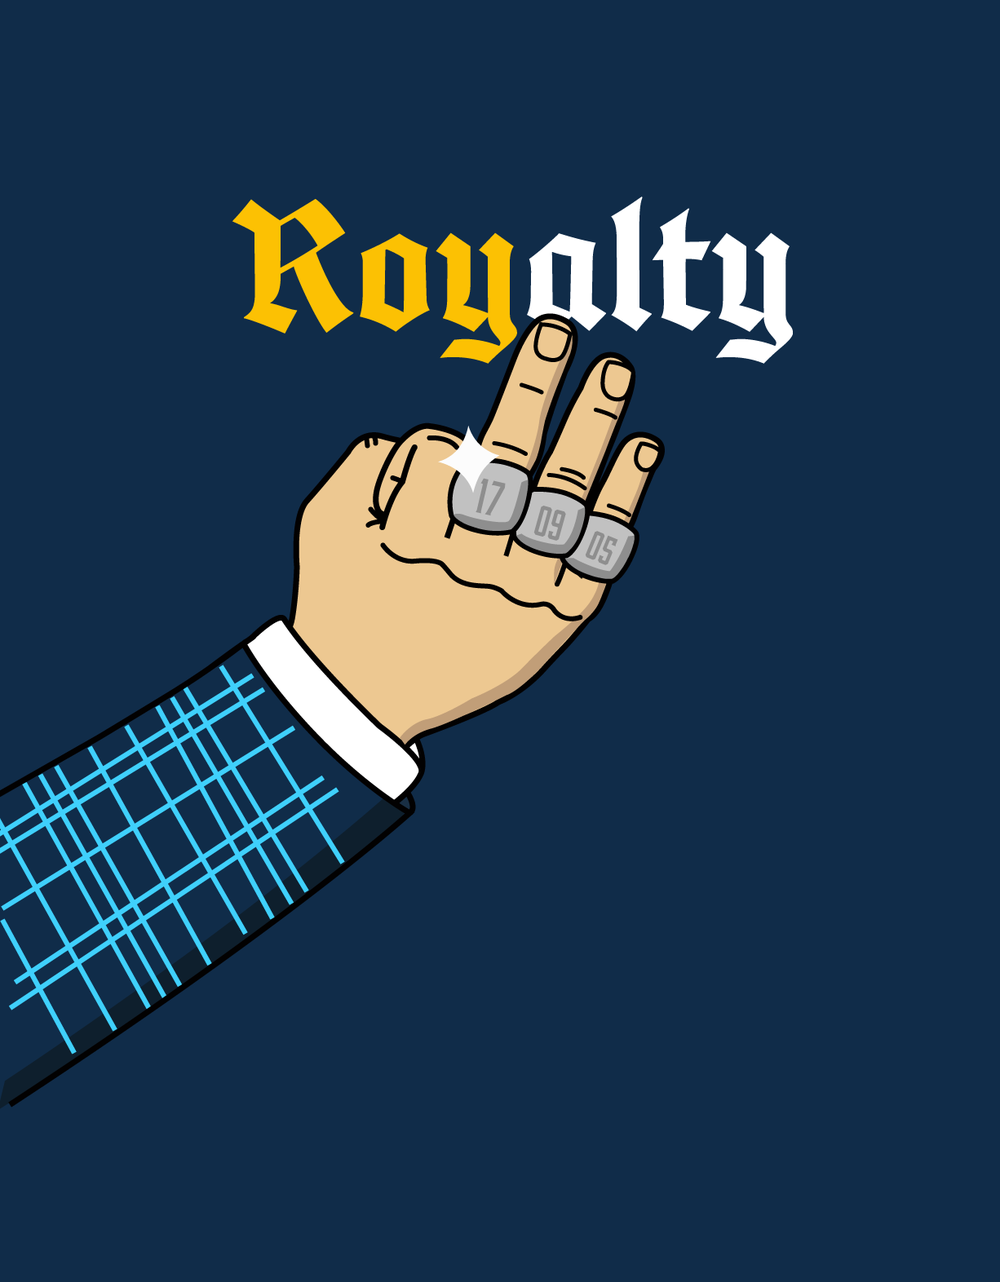 royalty_youaintryan.png